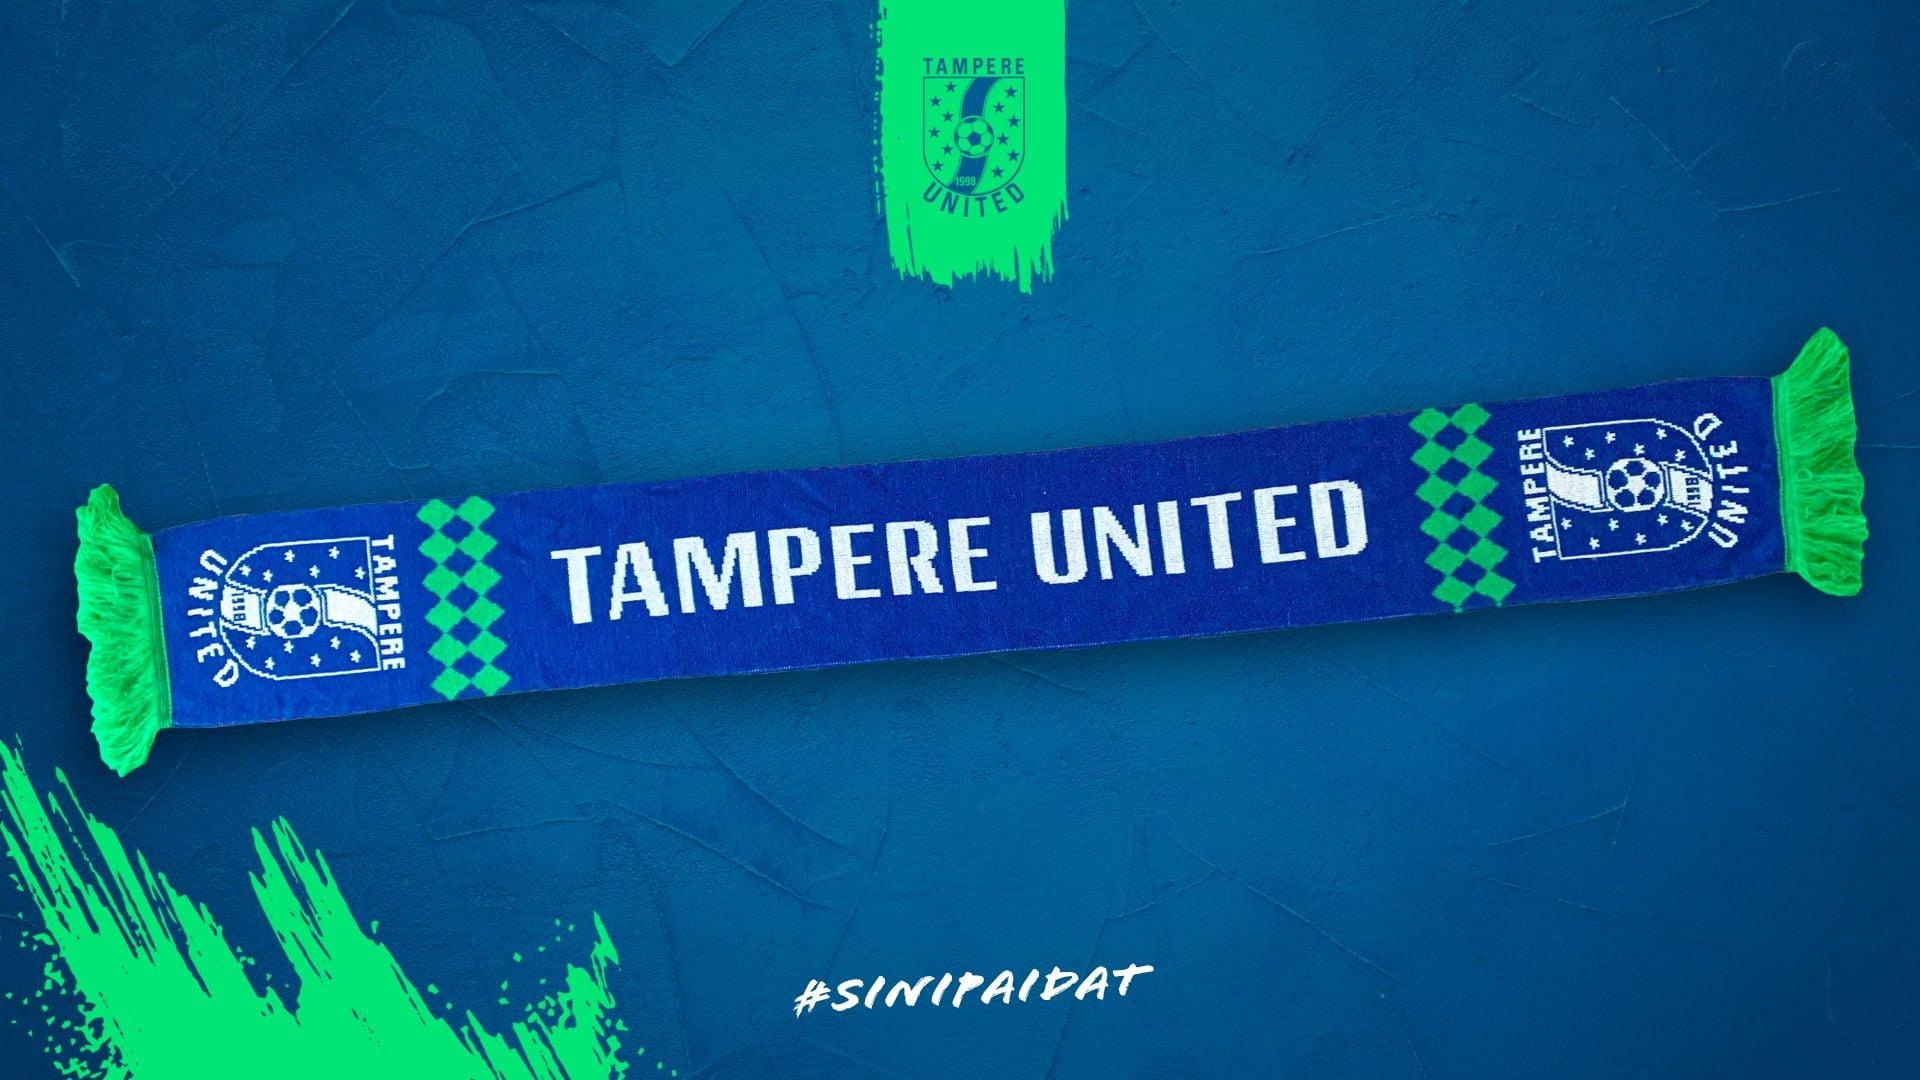 Tue Tampere Unitedia: osta uusi argyle-kuvioinen TamU-huivi -uutiskuva